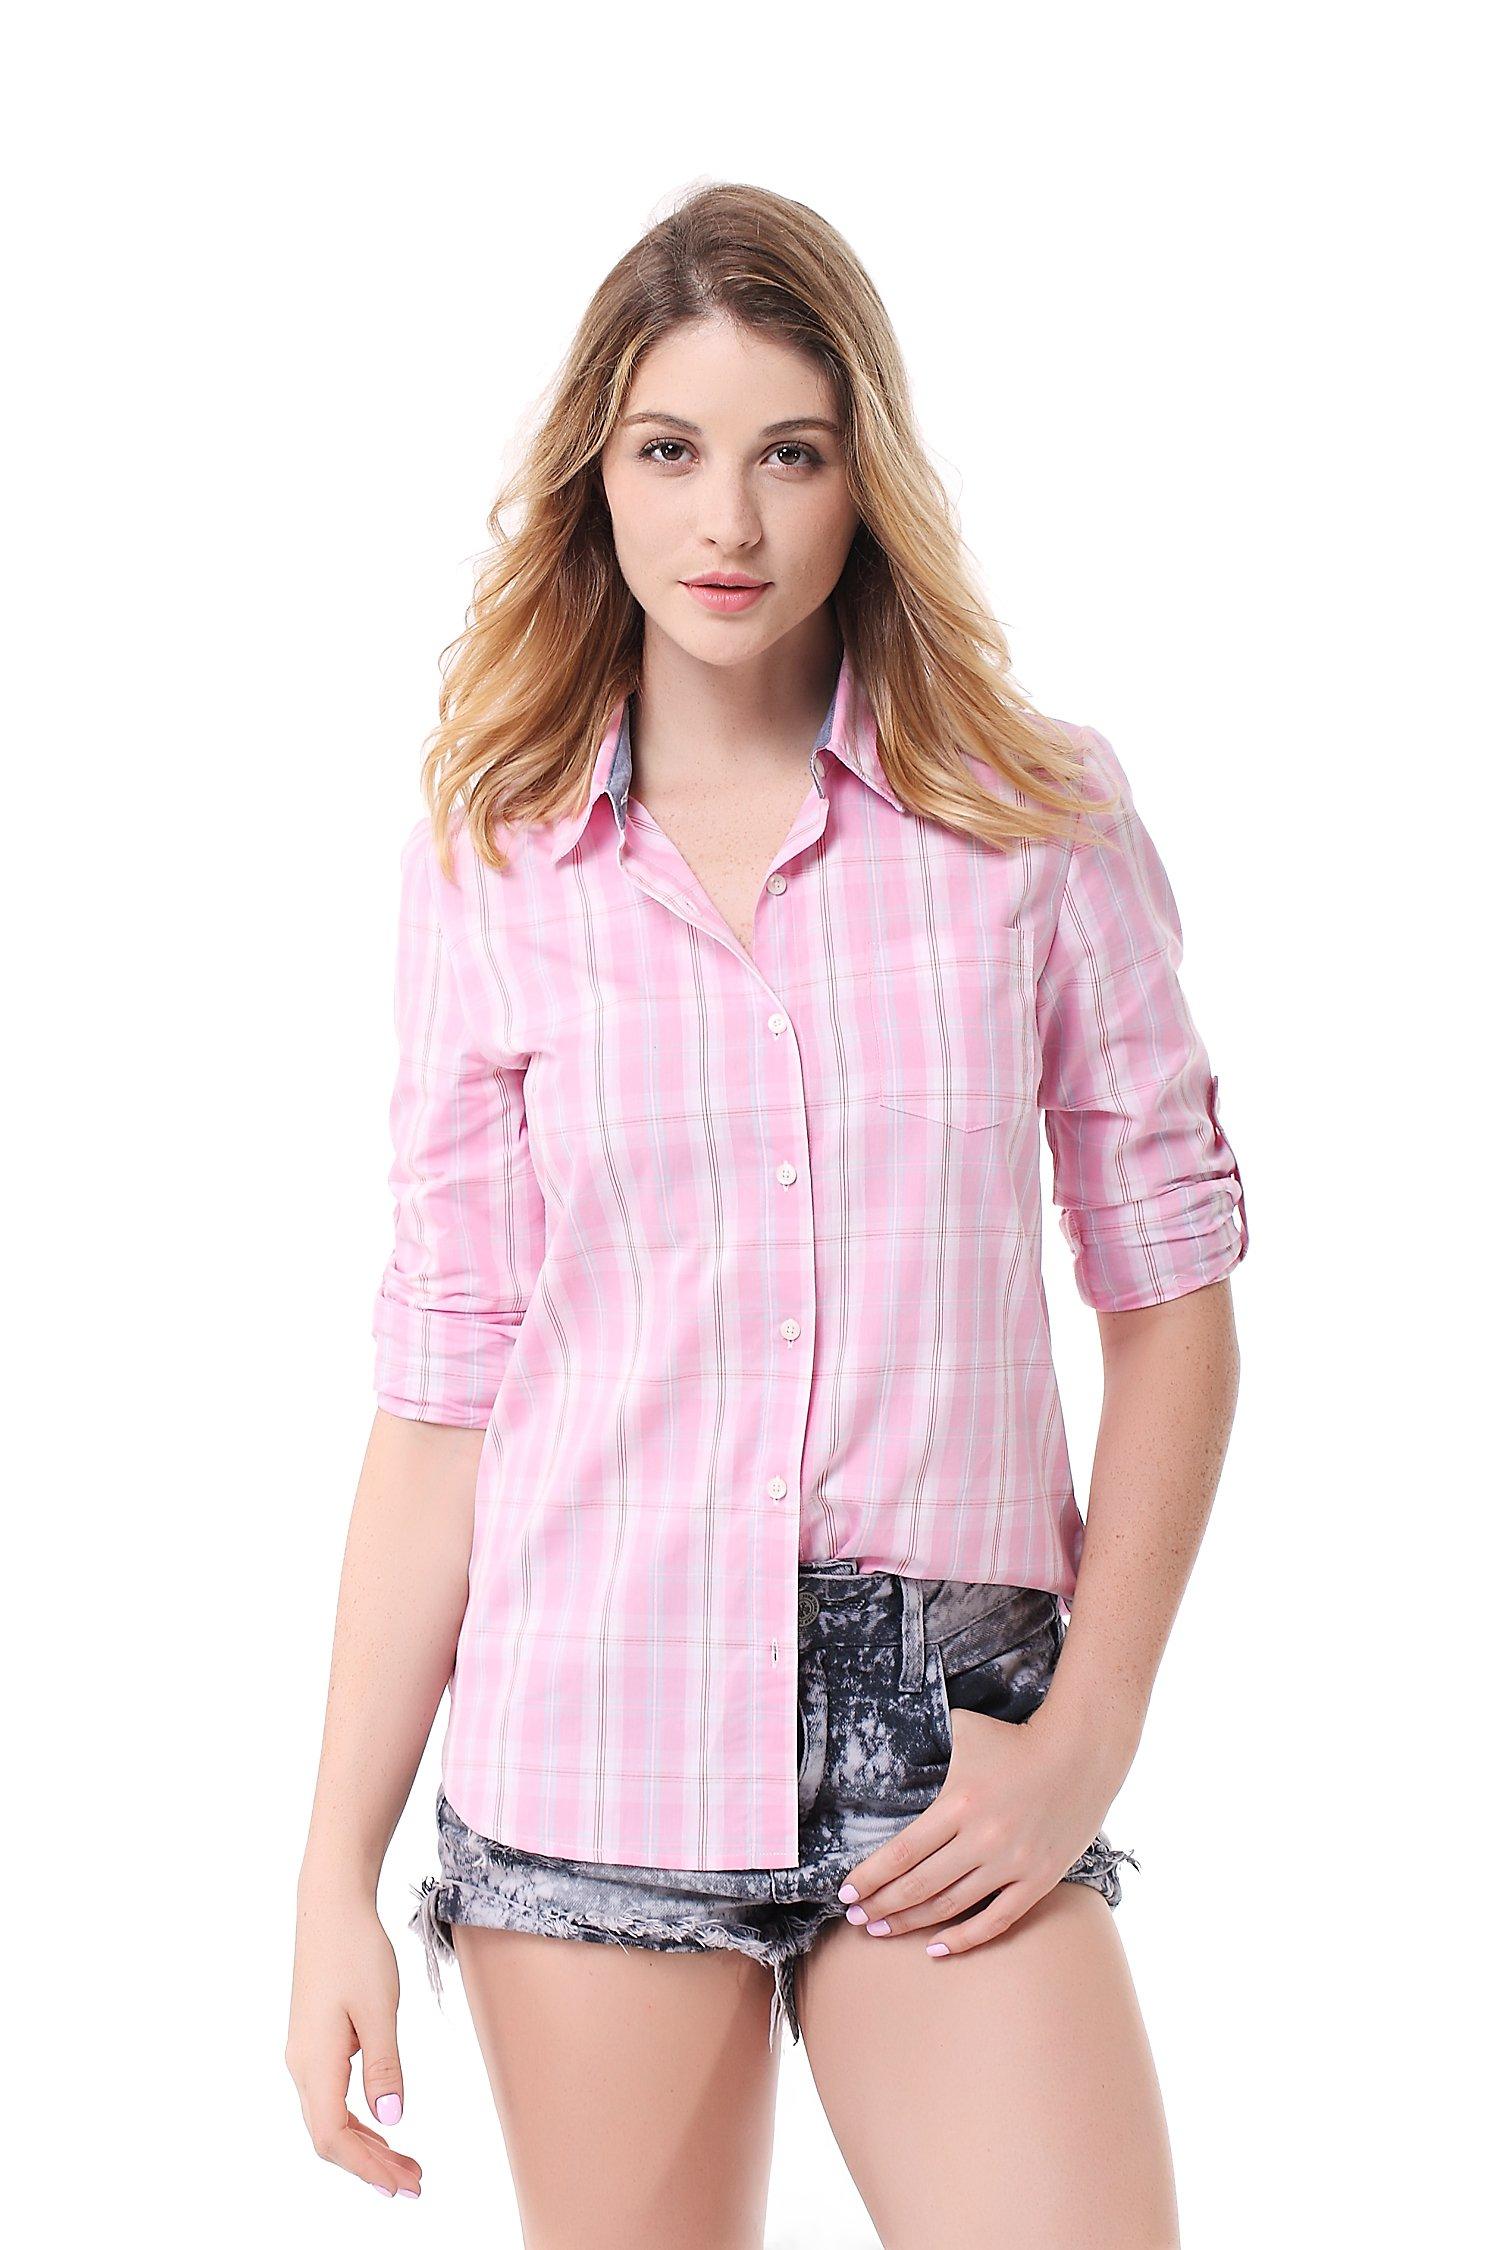 Pau1Hami1ton G-03 Women's Casual Plaid Long Sleeve Blouses Cotton Shirts Tops(S,14)